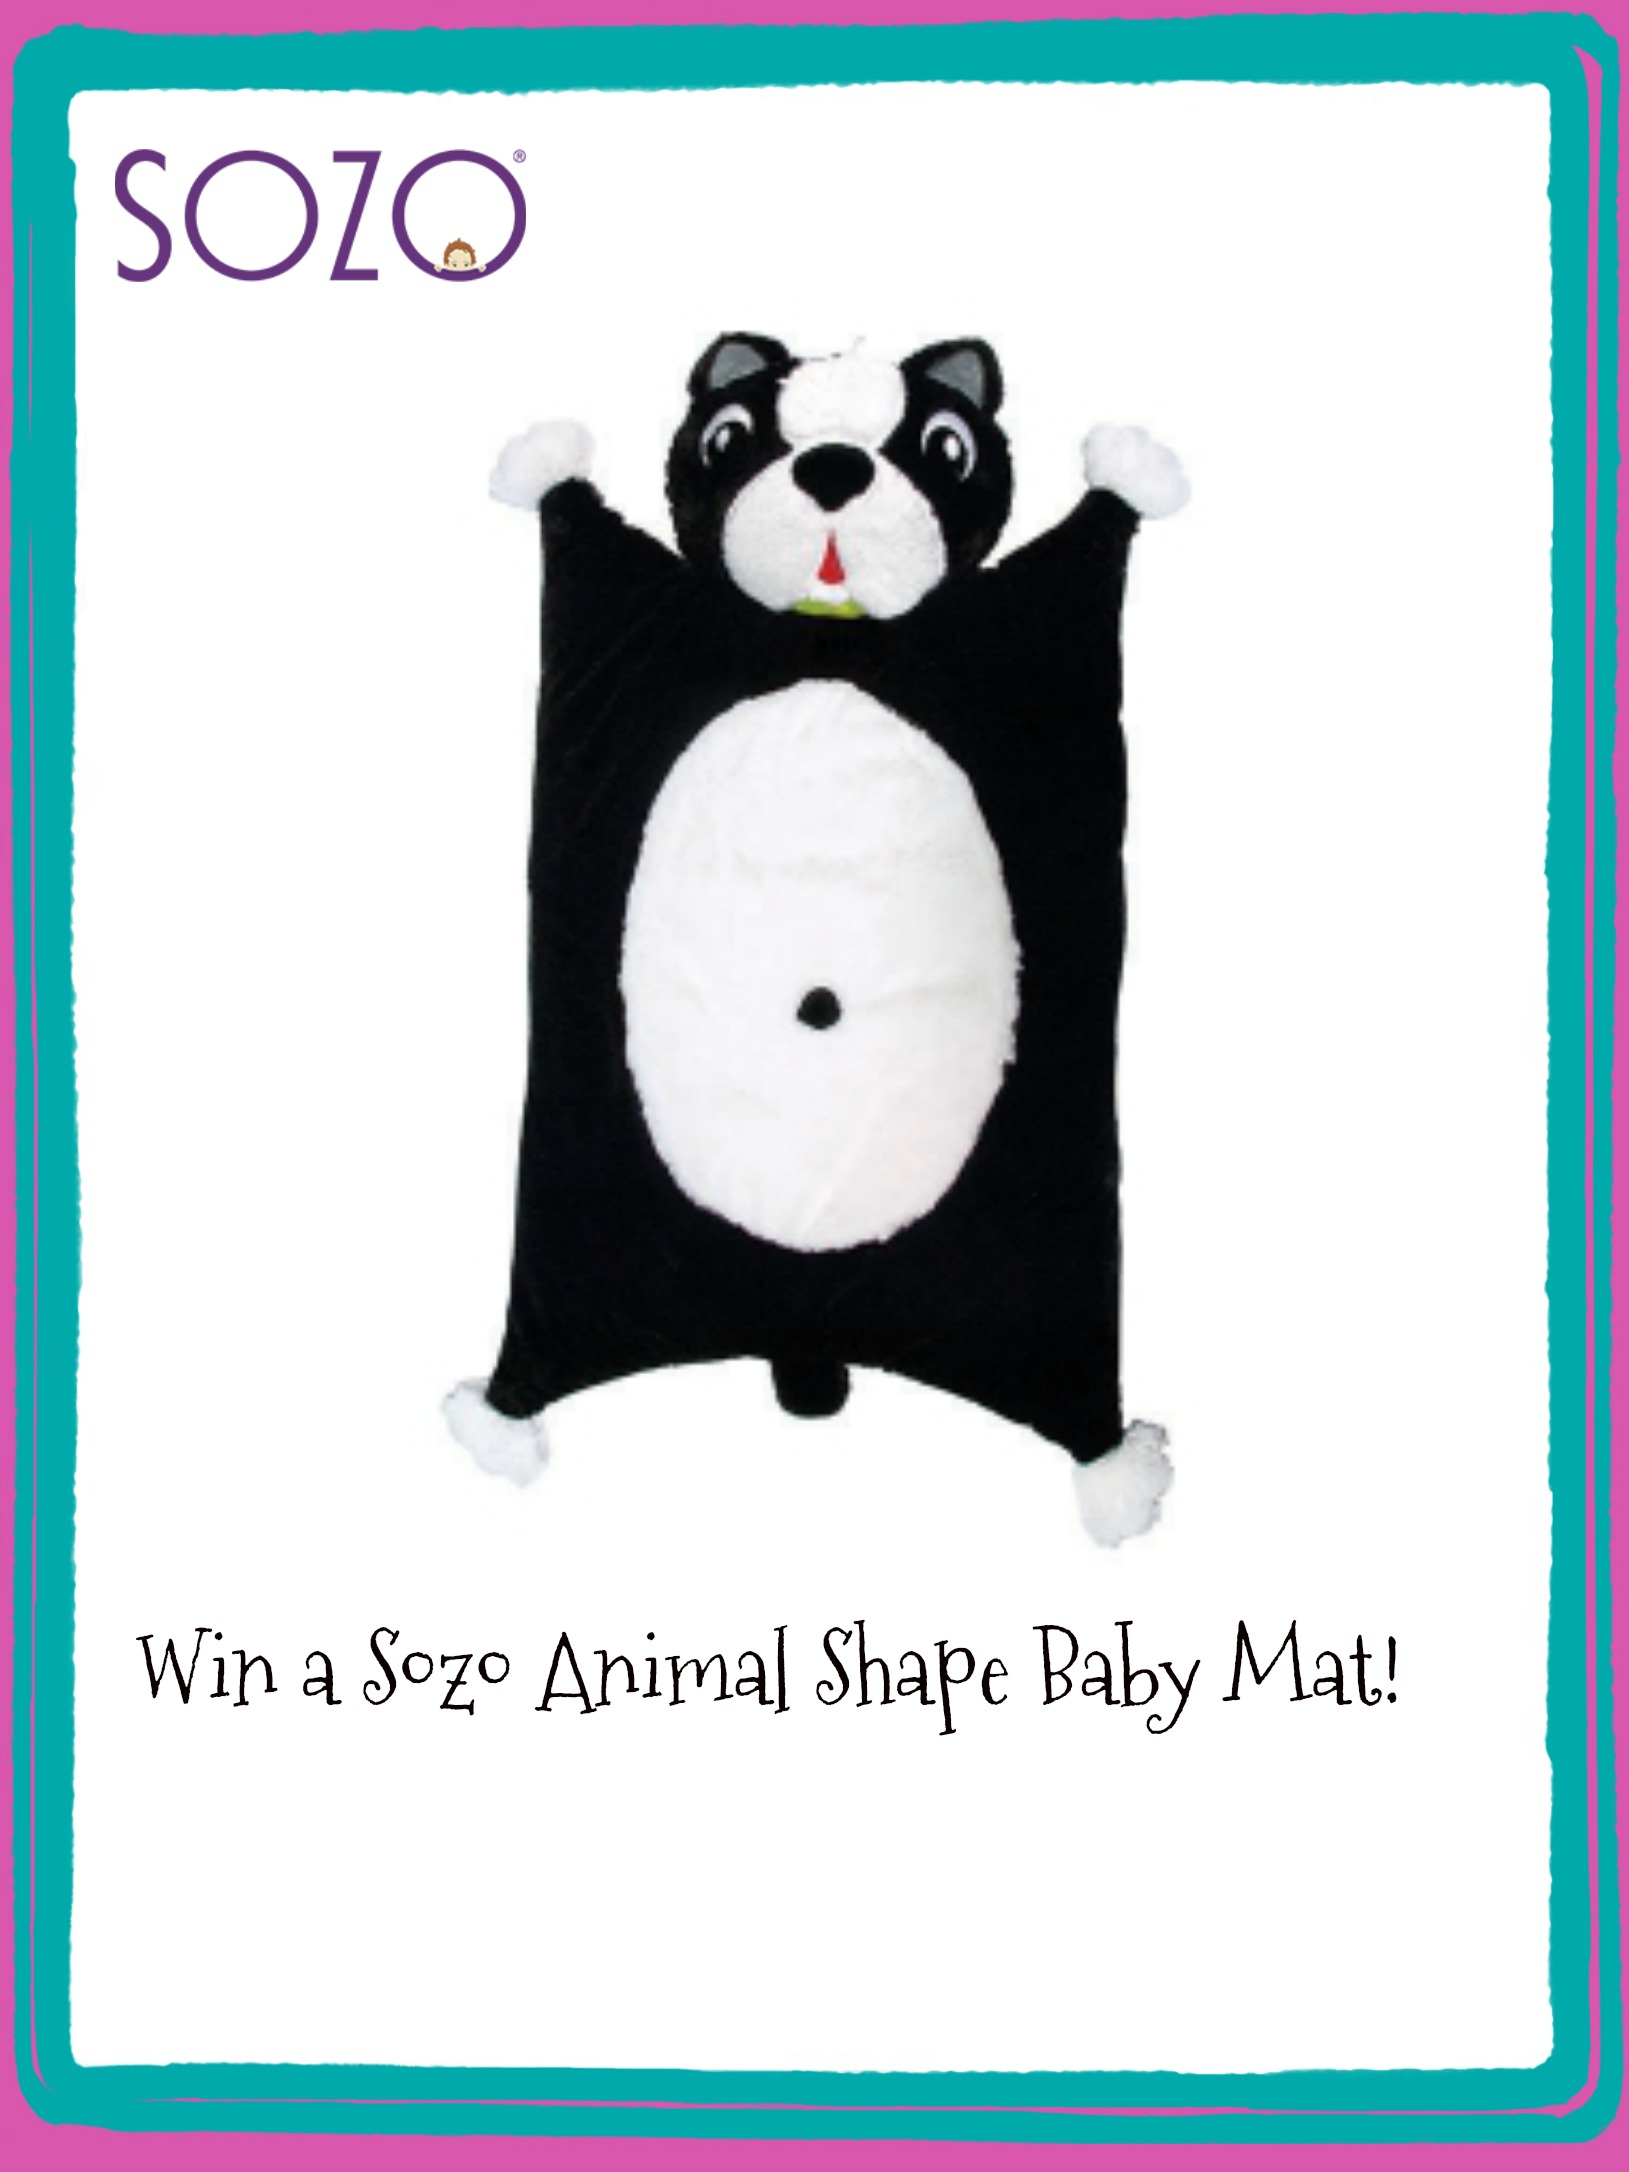 Sozo Animal Shape Baby Mats are Fun and Cute!